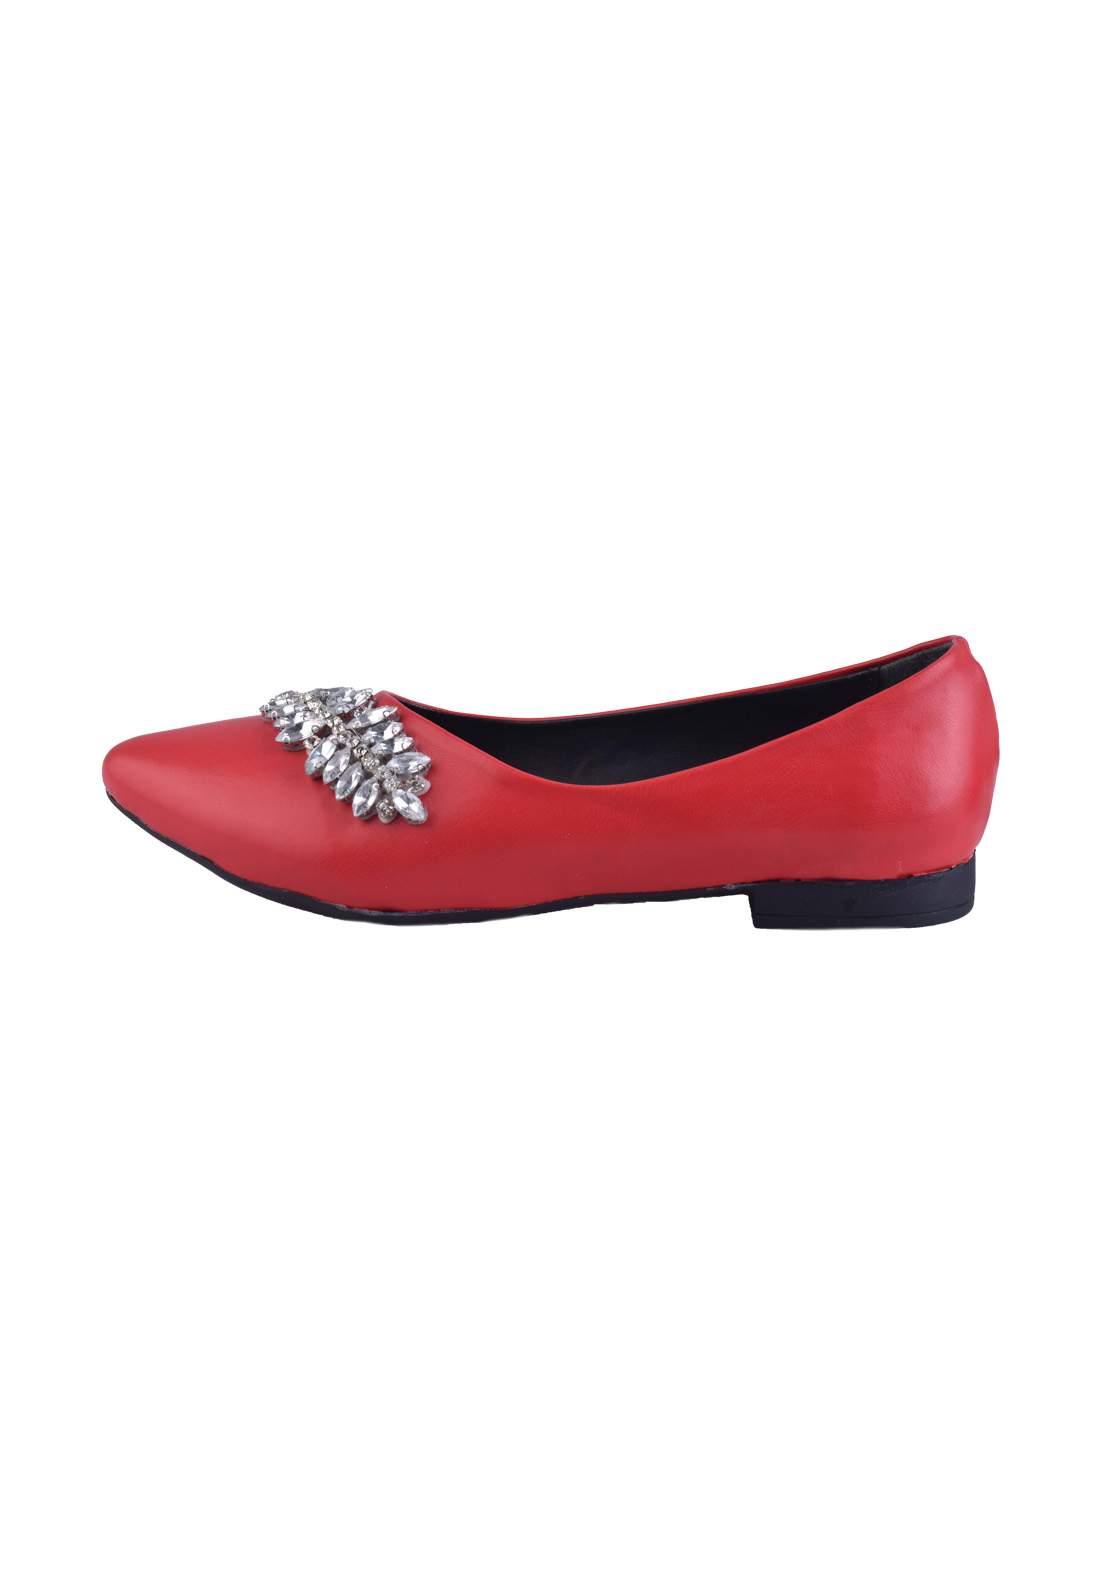 حذاء نسائي  احمر اللون